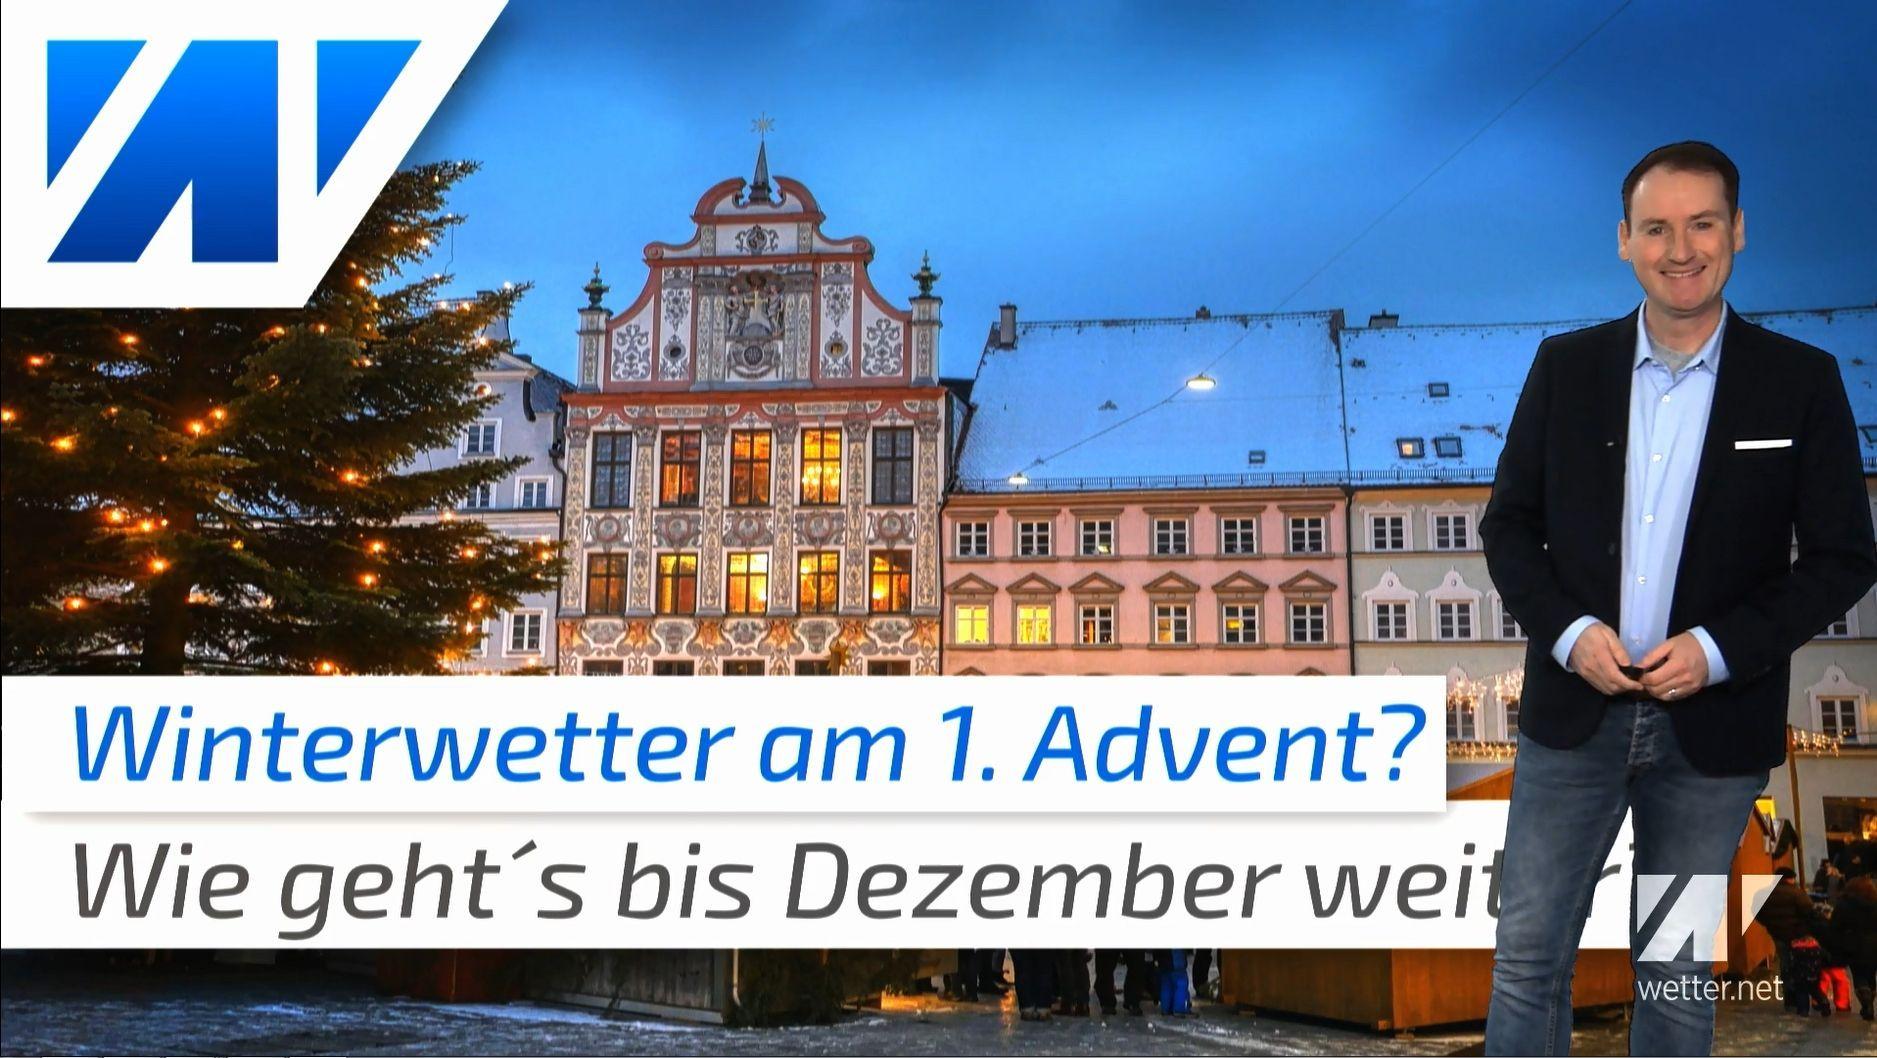 Wetterexperte verrät: So wird das Wetter am 1. Advent!